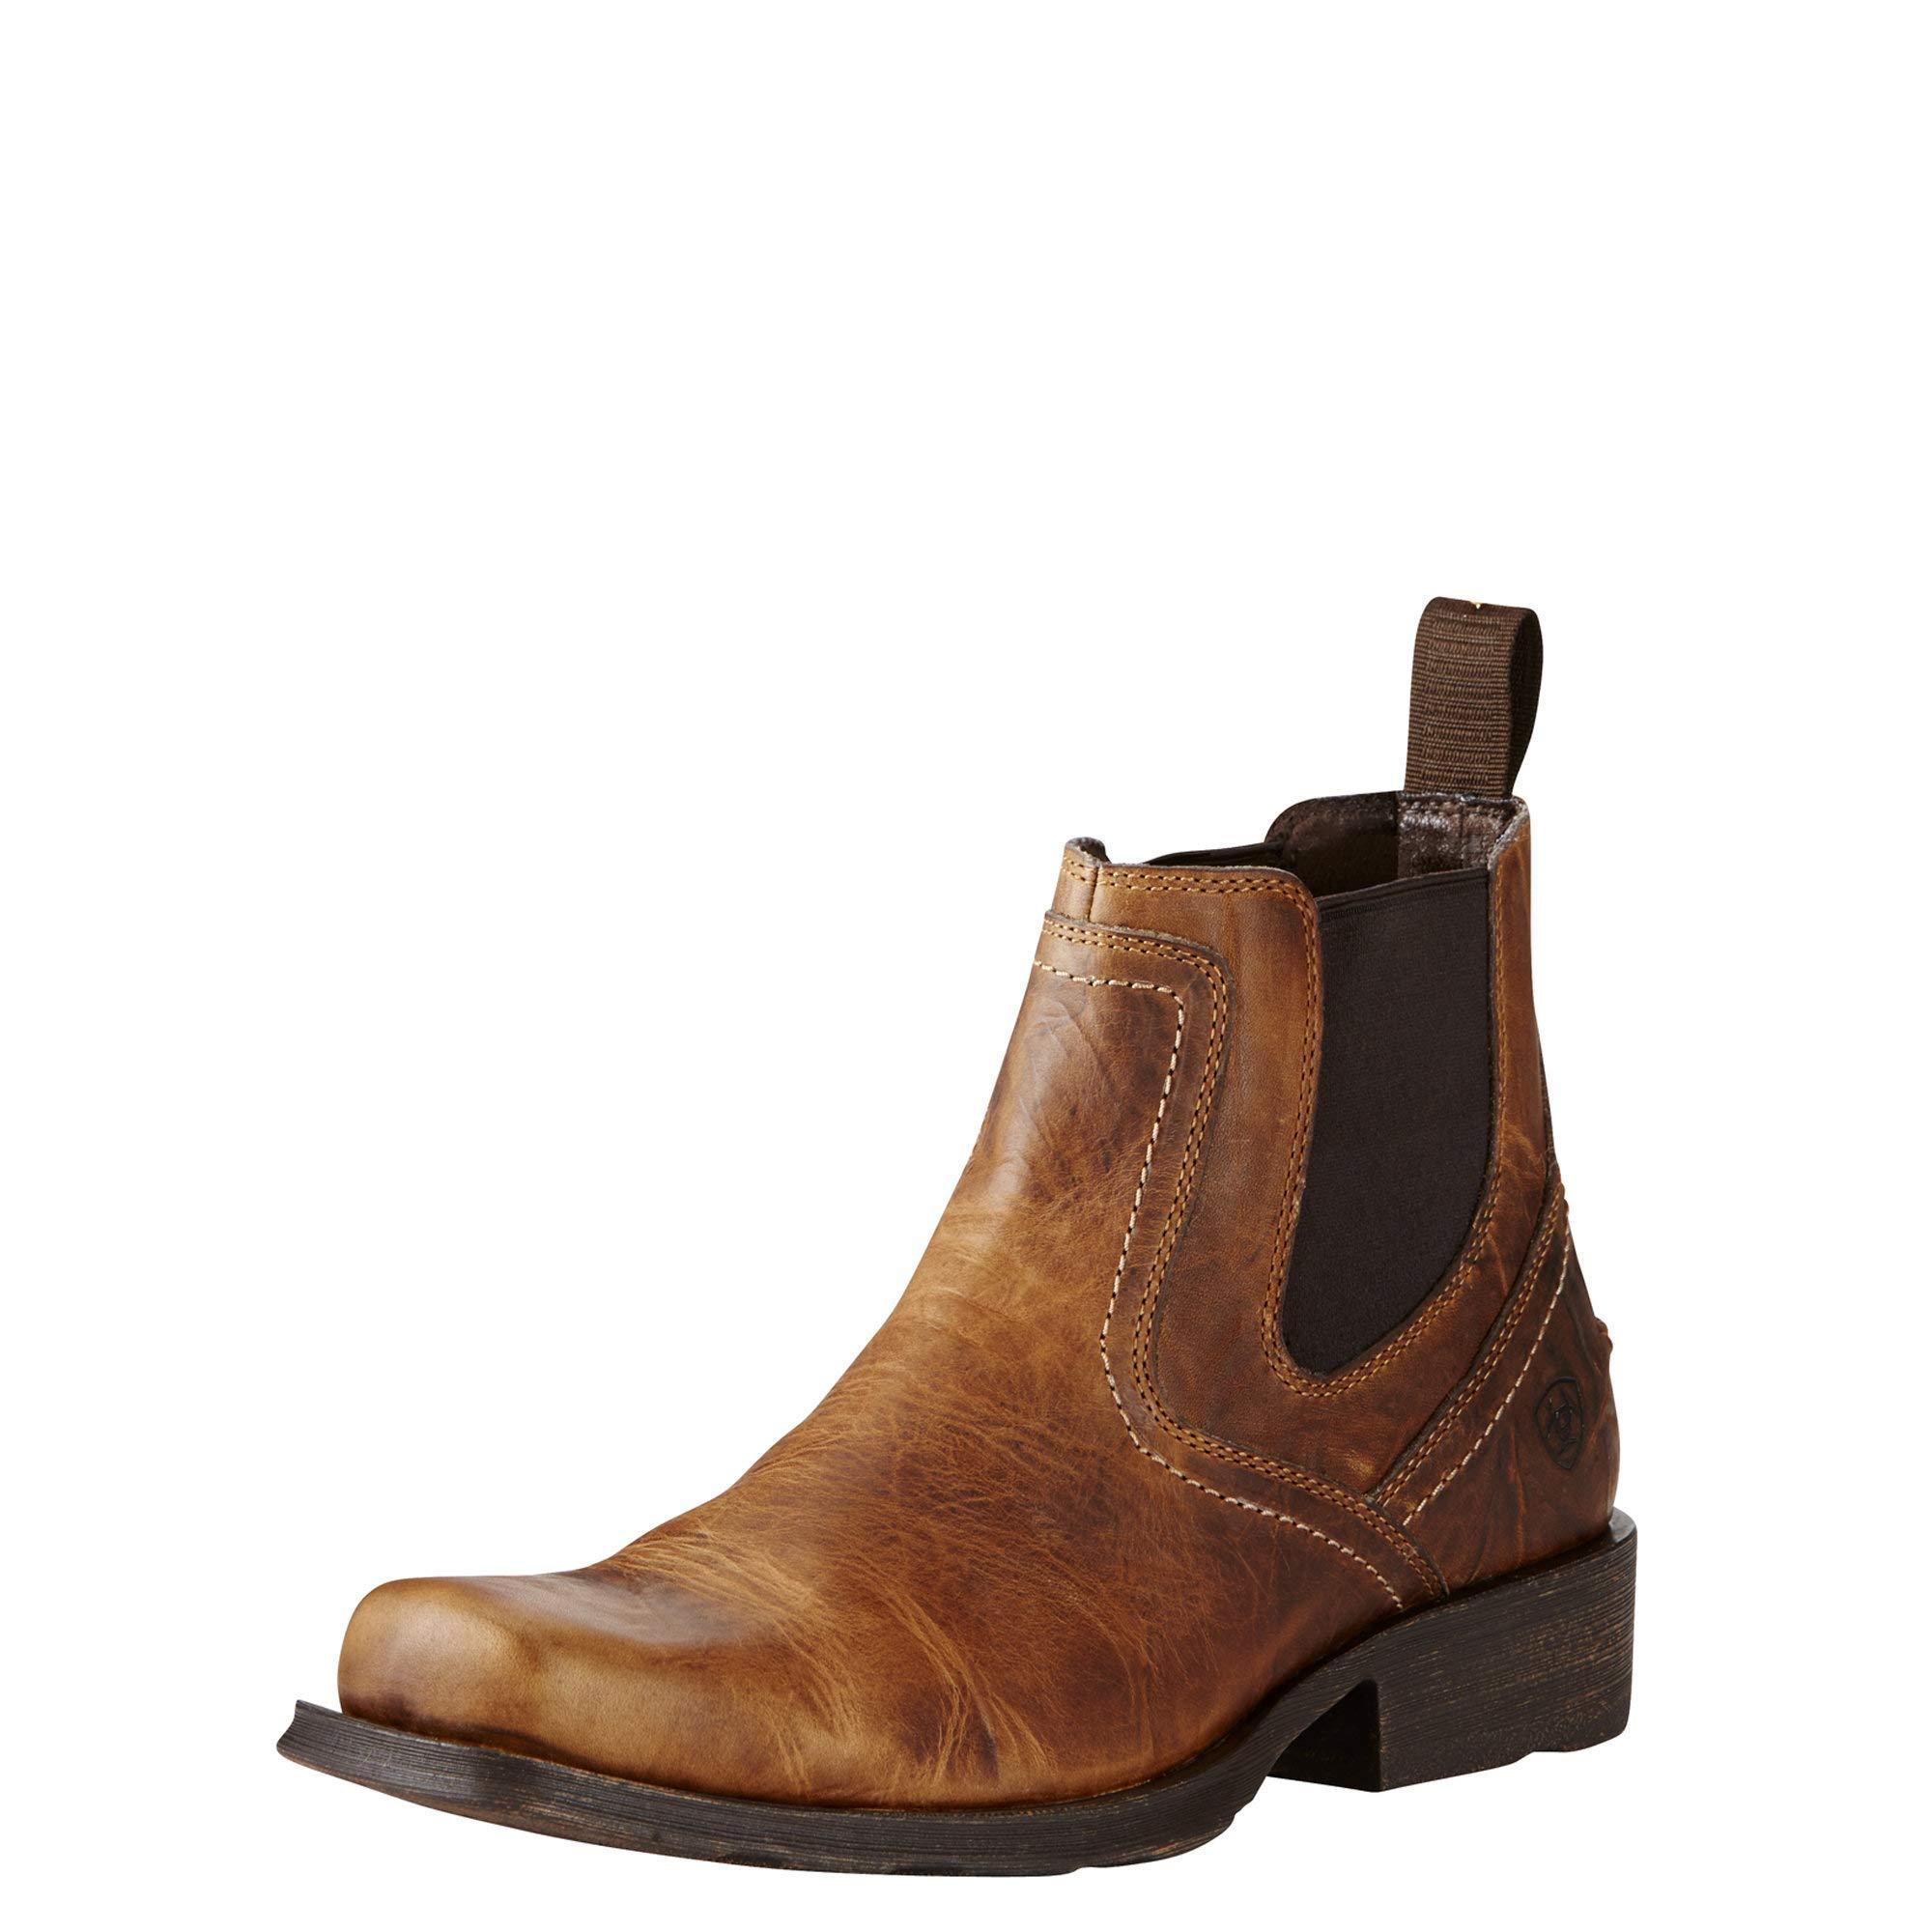 Ariat Men's Midtown Rambler Casual Boot, Barn Brown, 9.5 D US by ARIAT